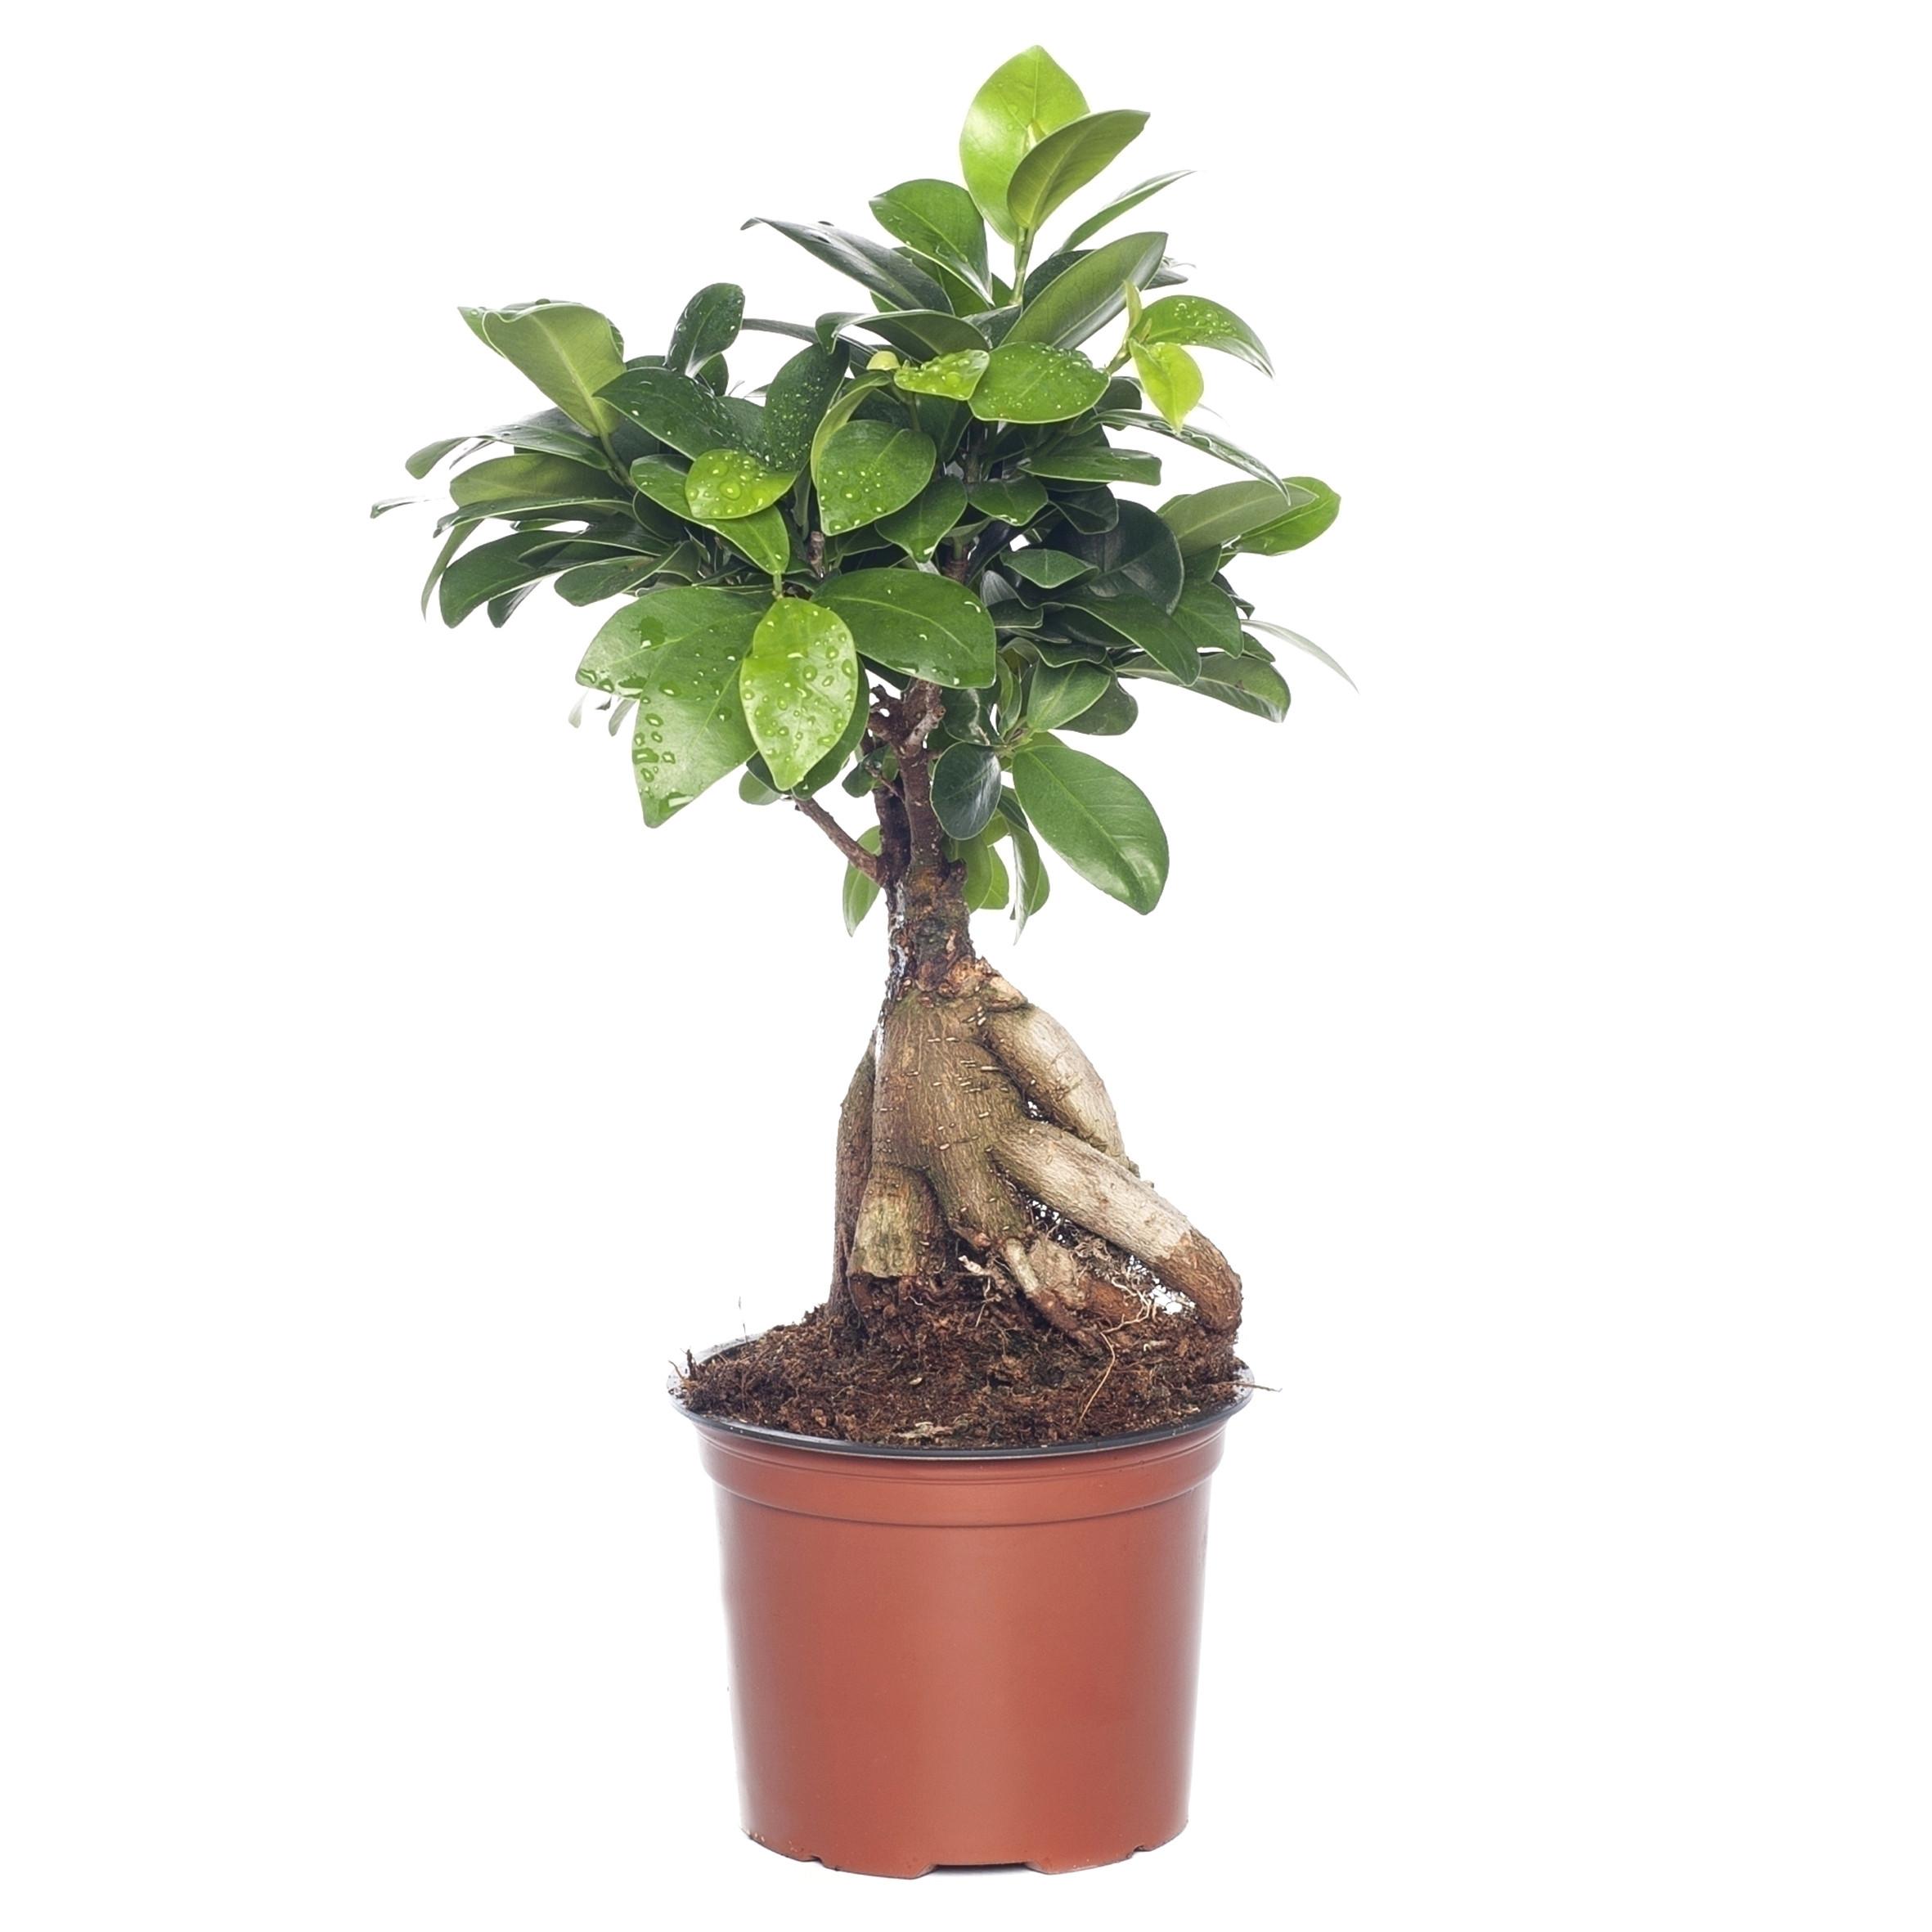 ficus microcarpa ginseng pflege schon bonsai verzorgen podocarpus bonsai with bonsai verzorgen top